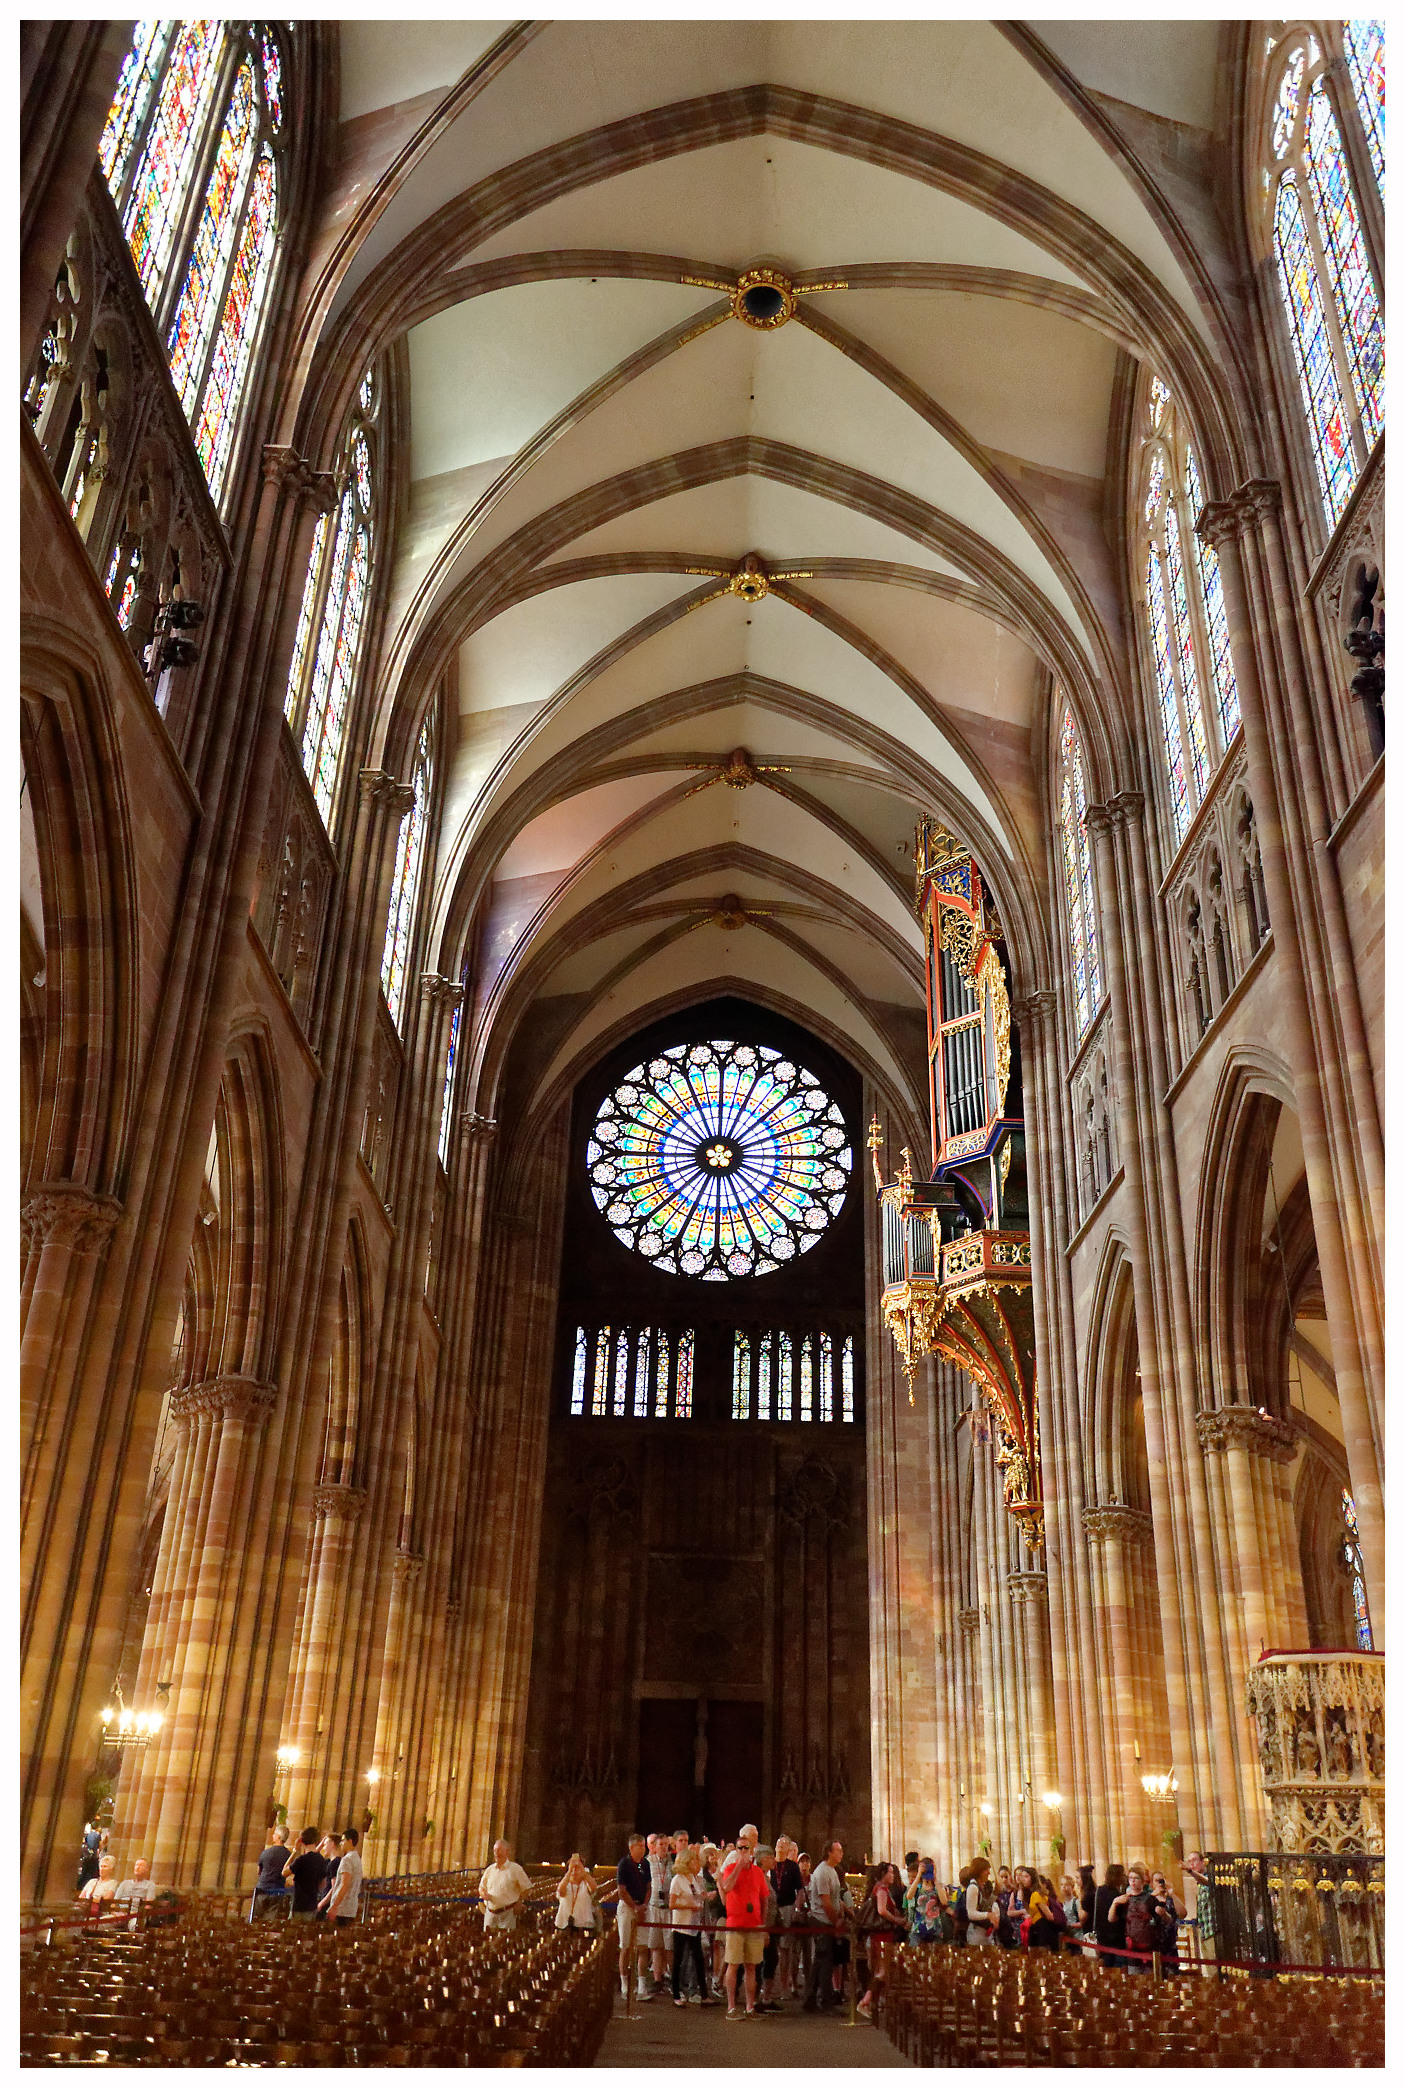 Visiter Strasbourg en un week-end